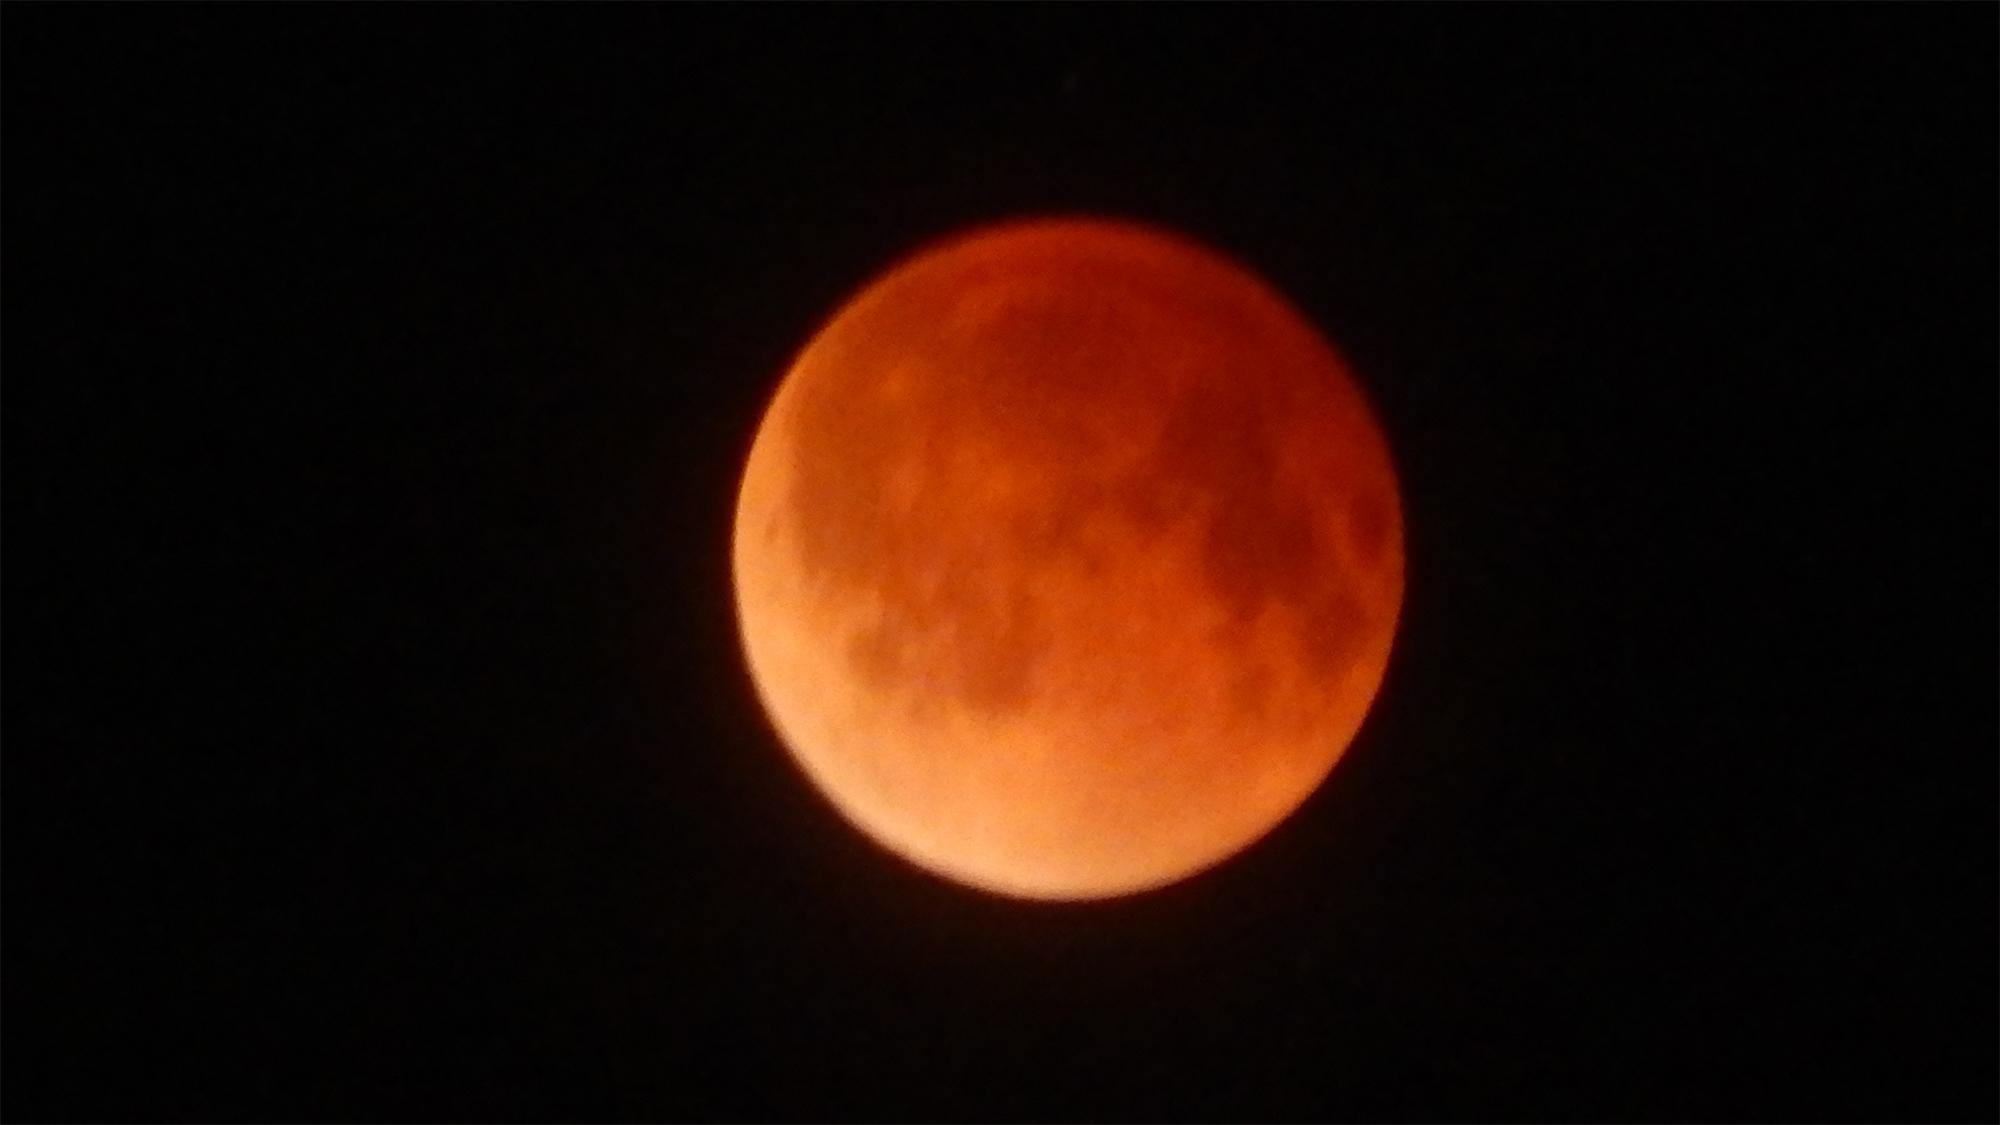 Lunar Eclipse 'Blood Moon' April 15, 2014 from Sun City Center